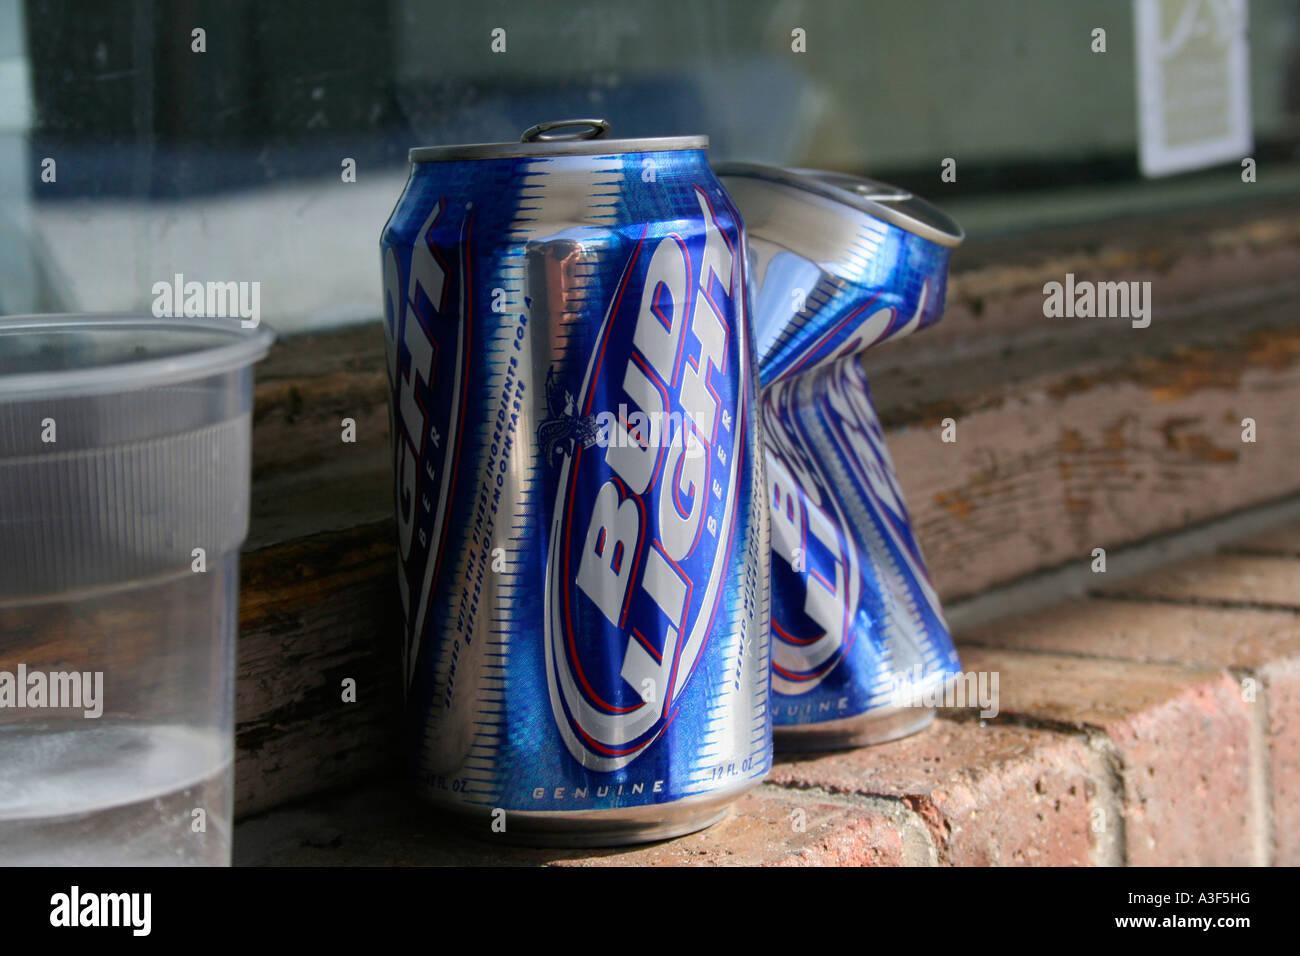 Empty Bud Light Cans On Window Ledge   Stock Image